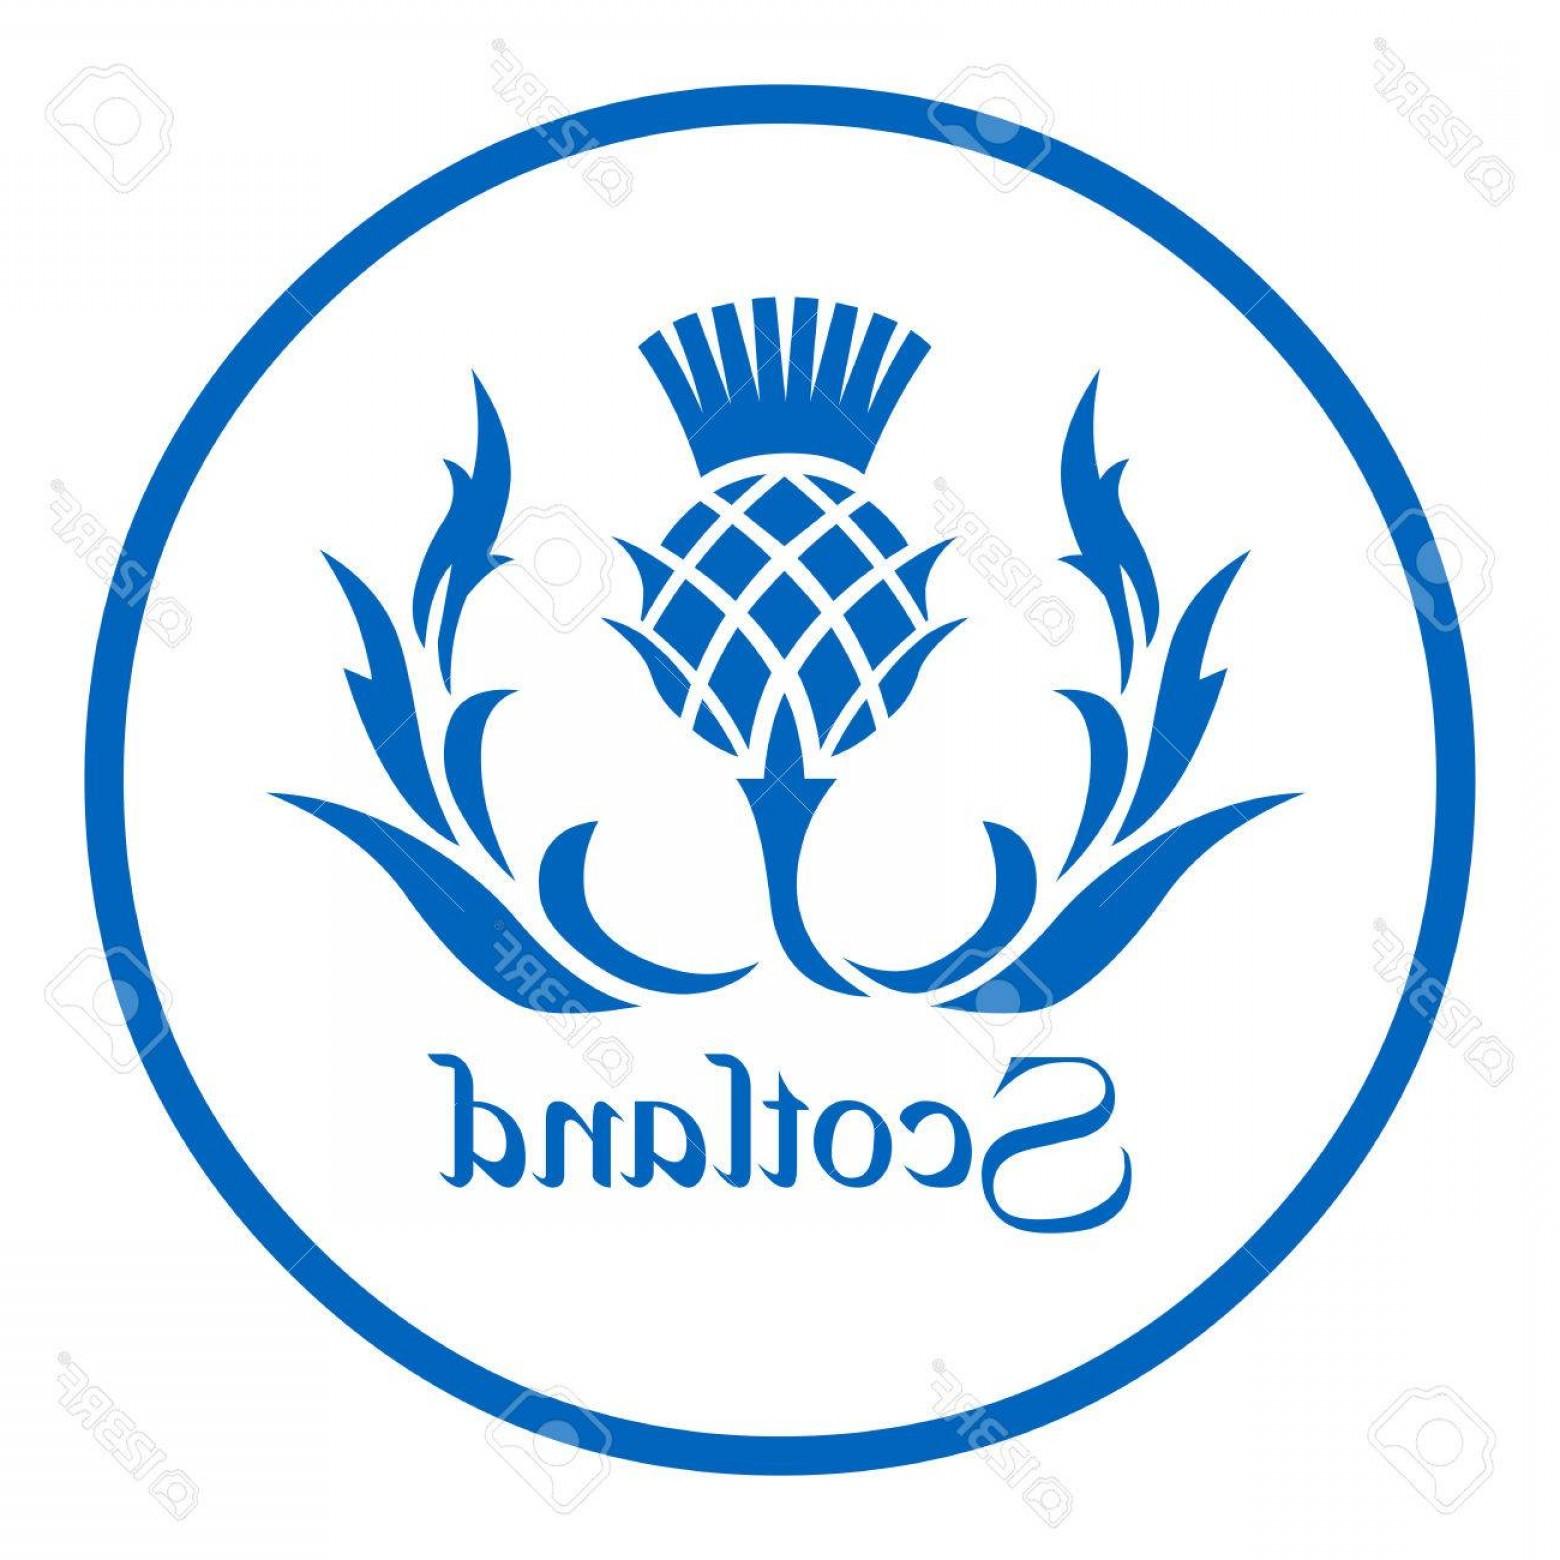 1560x1560 Photostock Vector Floral Emblem Of Scotland The Thistle Createmepink